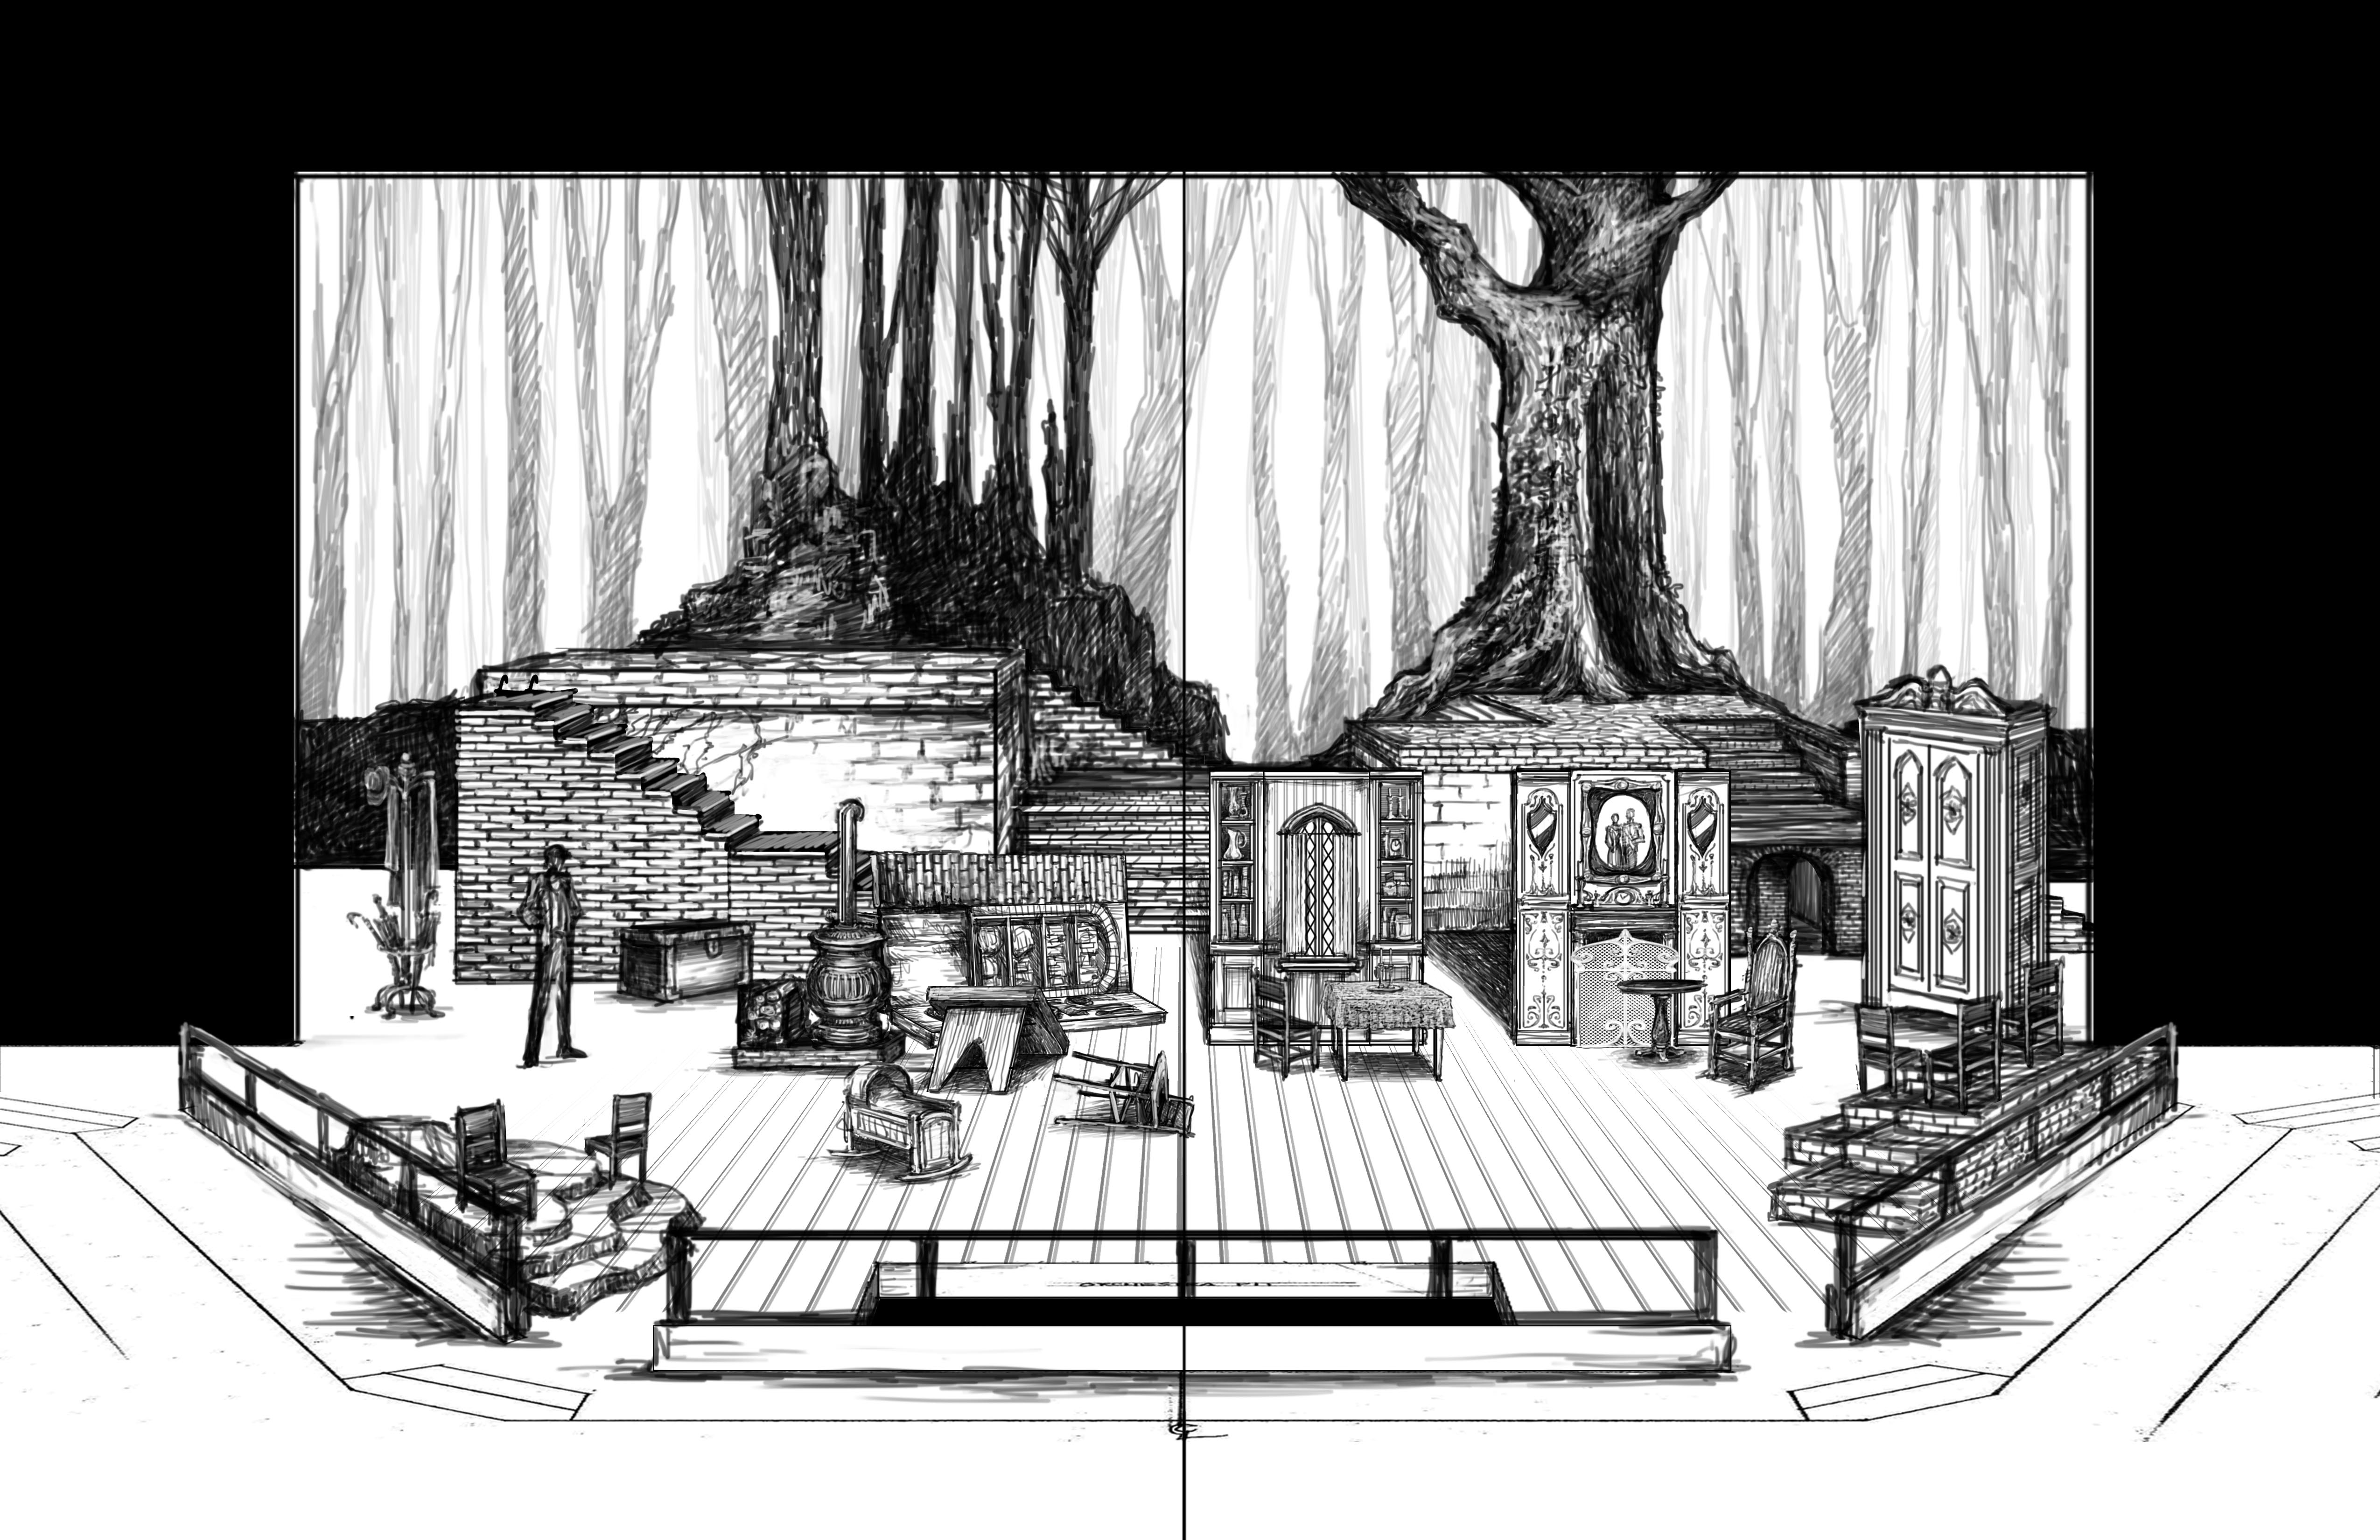 15. Threee Houses, ruined